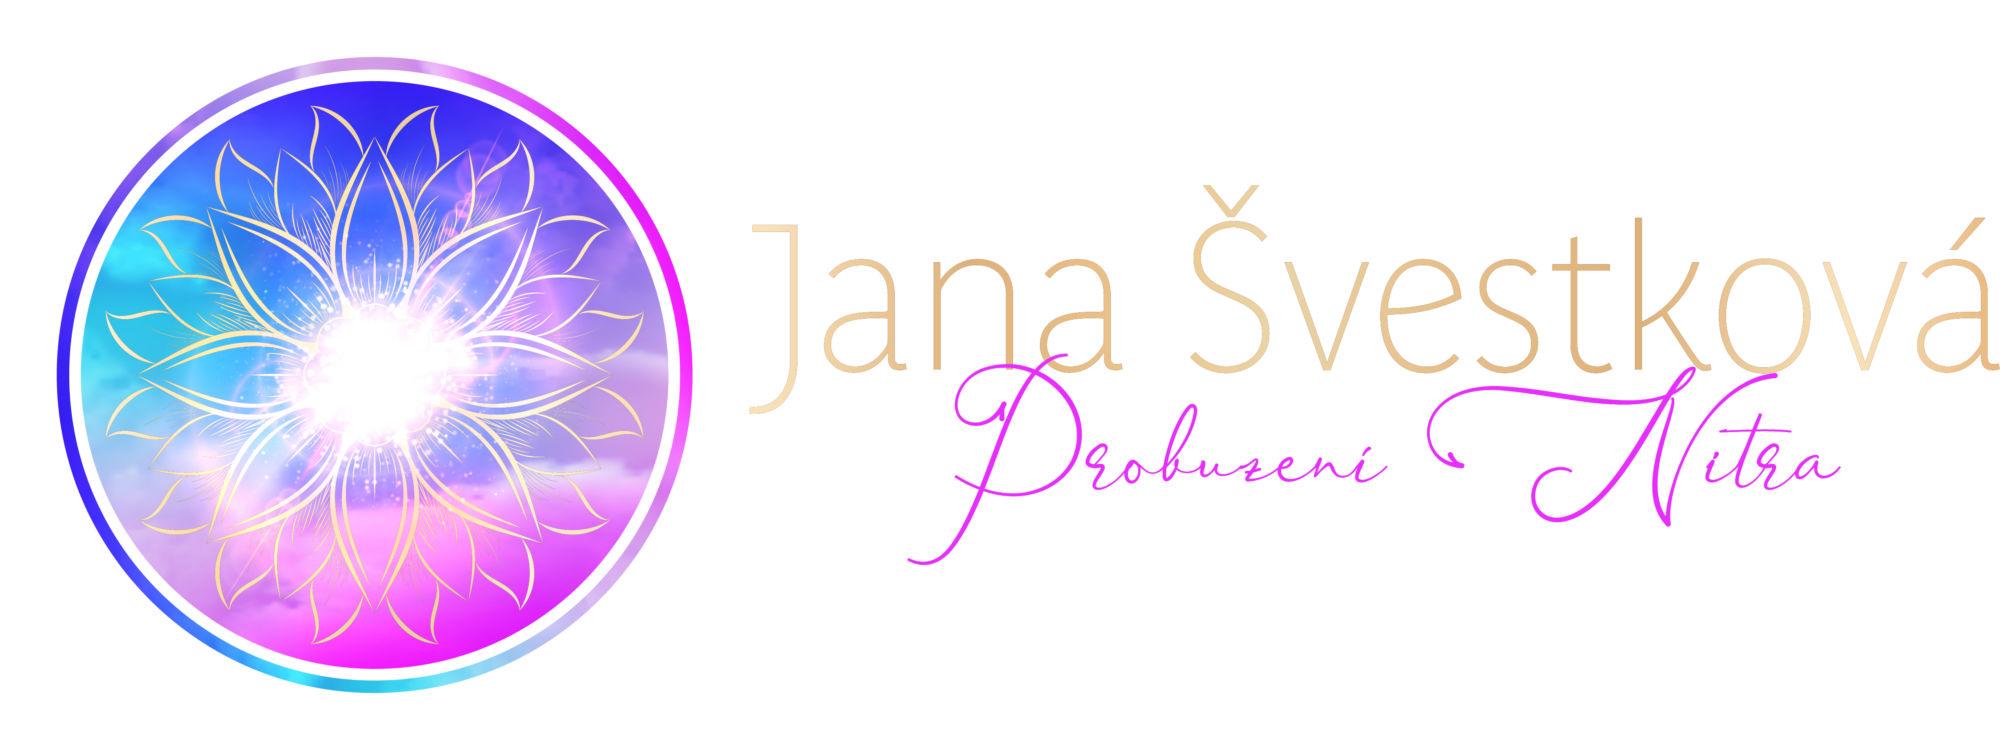 Jana Švestková